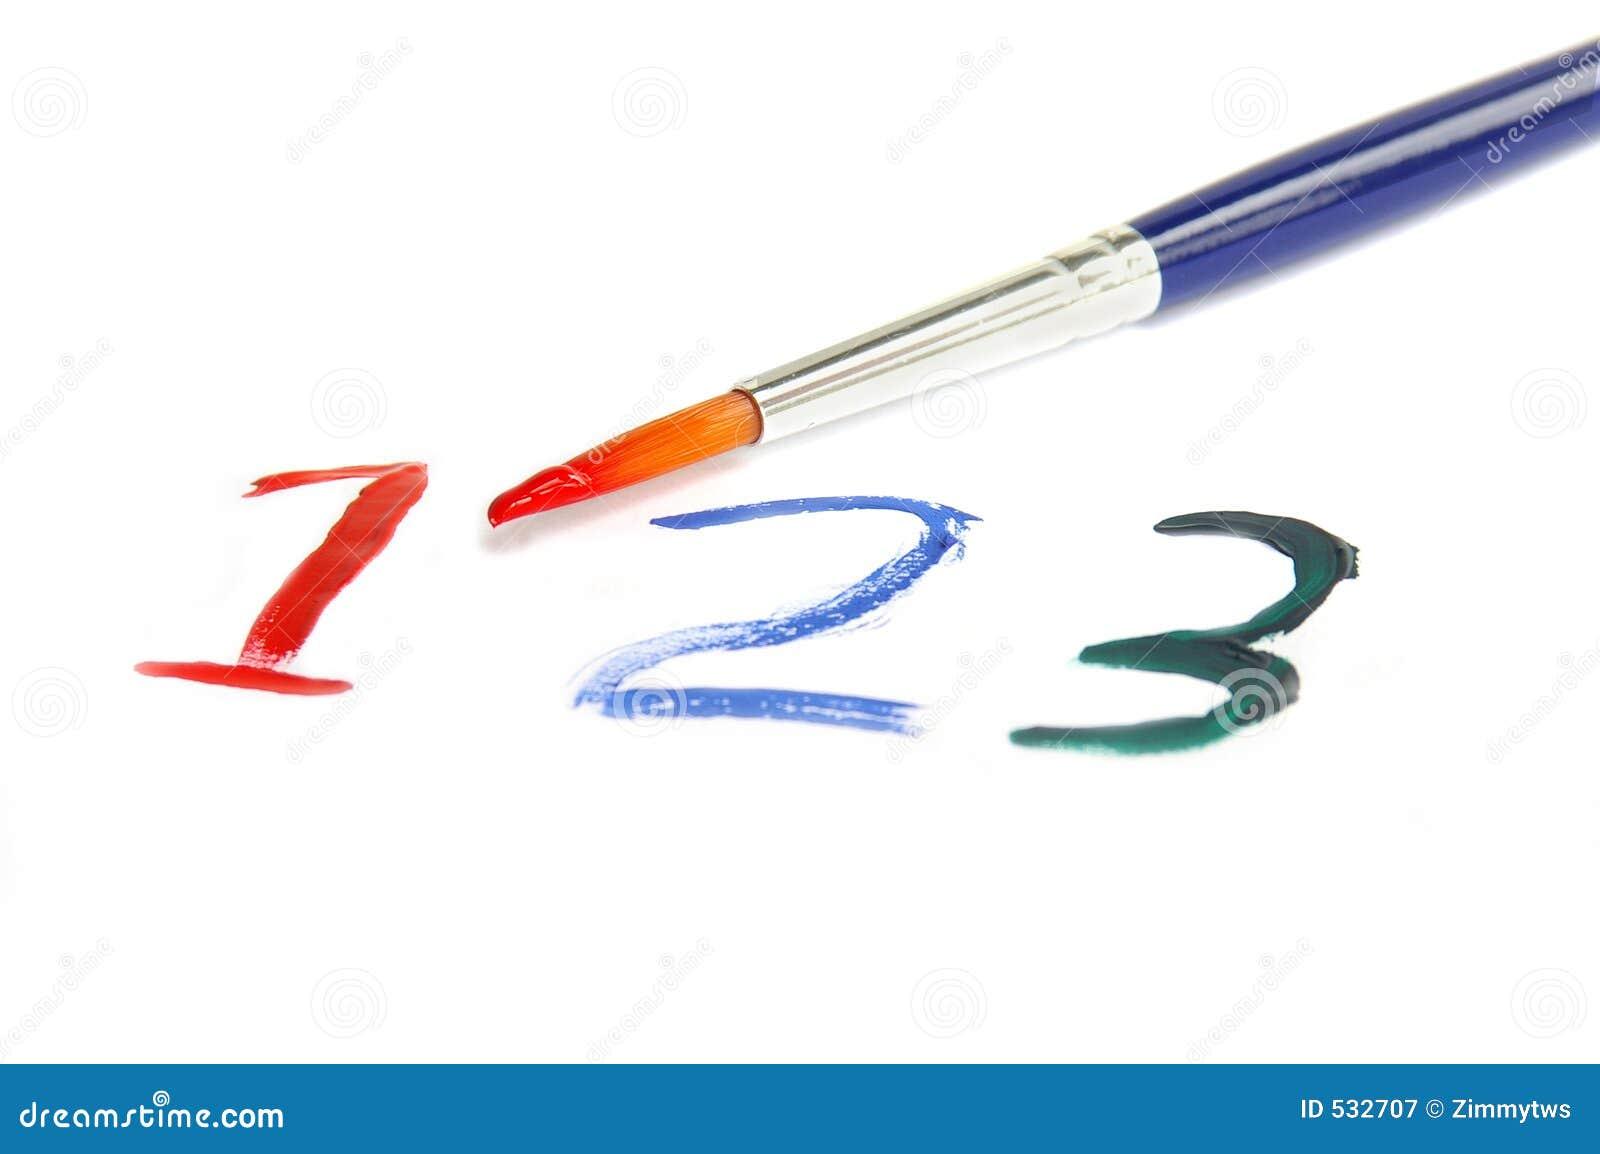 Download 计数 库存图片. 图片 包括有 艺术性, 五颜六色, 概念, 凹道, 子项, 工艺, 线路, 数学, 小滴, 算术 - 532707